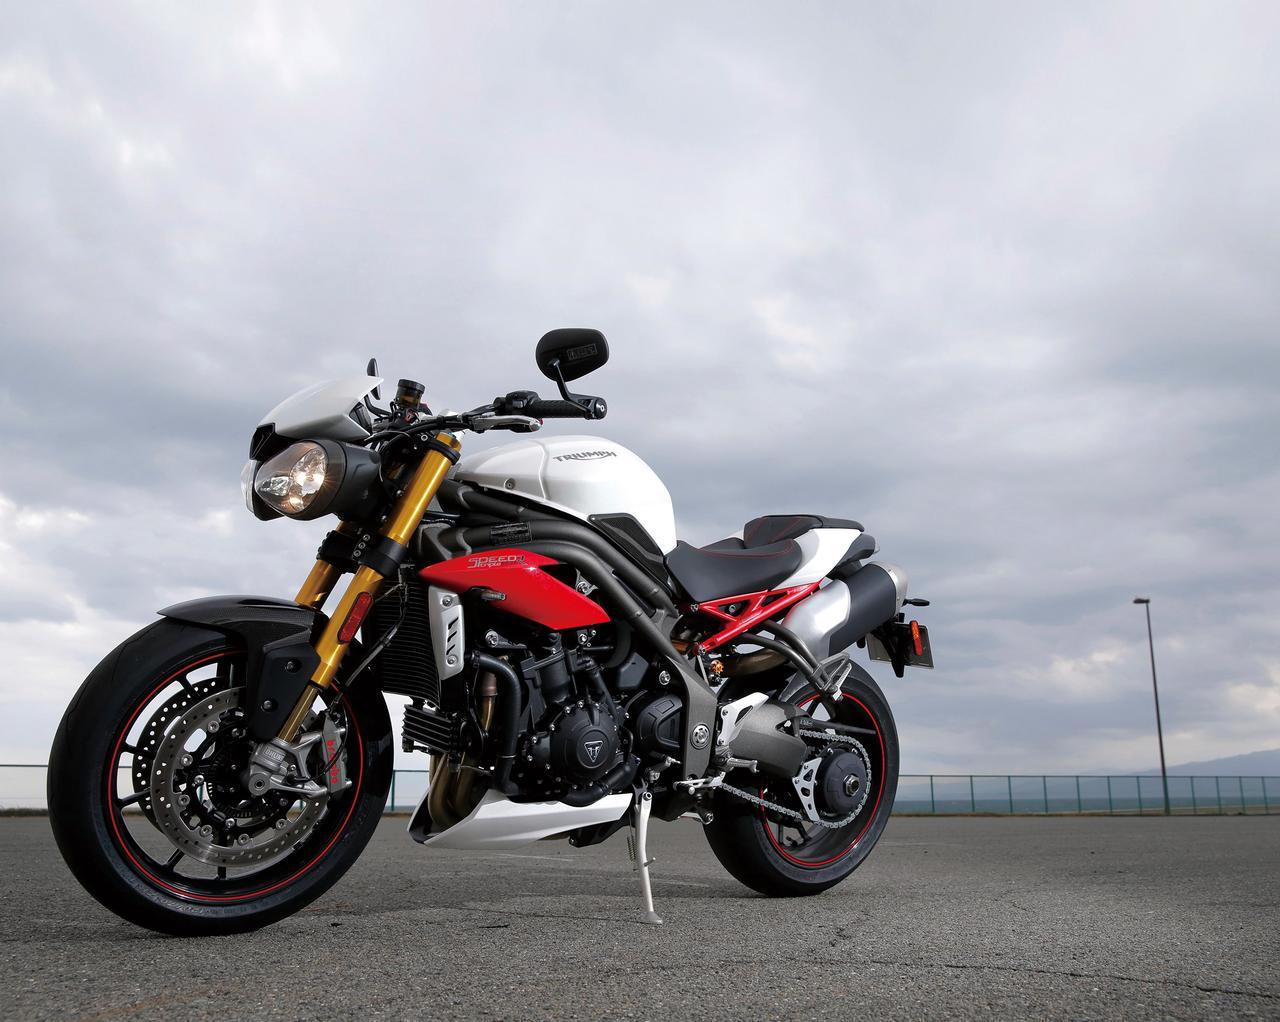 Images : 2番目の画像 - 「【TRIUMPH SPEED TRIPLE R】洗練度を大幅に高めて堂々の凱旋!魅惑の元祖ストリートファイター!【試乗インプレ】(2016)」のアルバム - LAWRENCE - Motorcycle x Cars + α = Your Life.